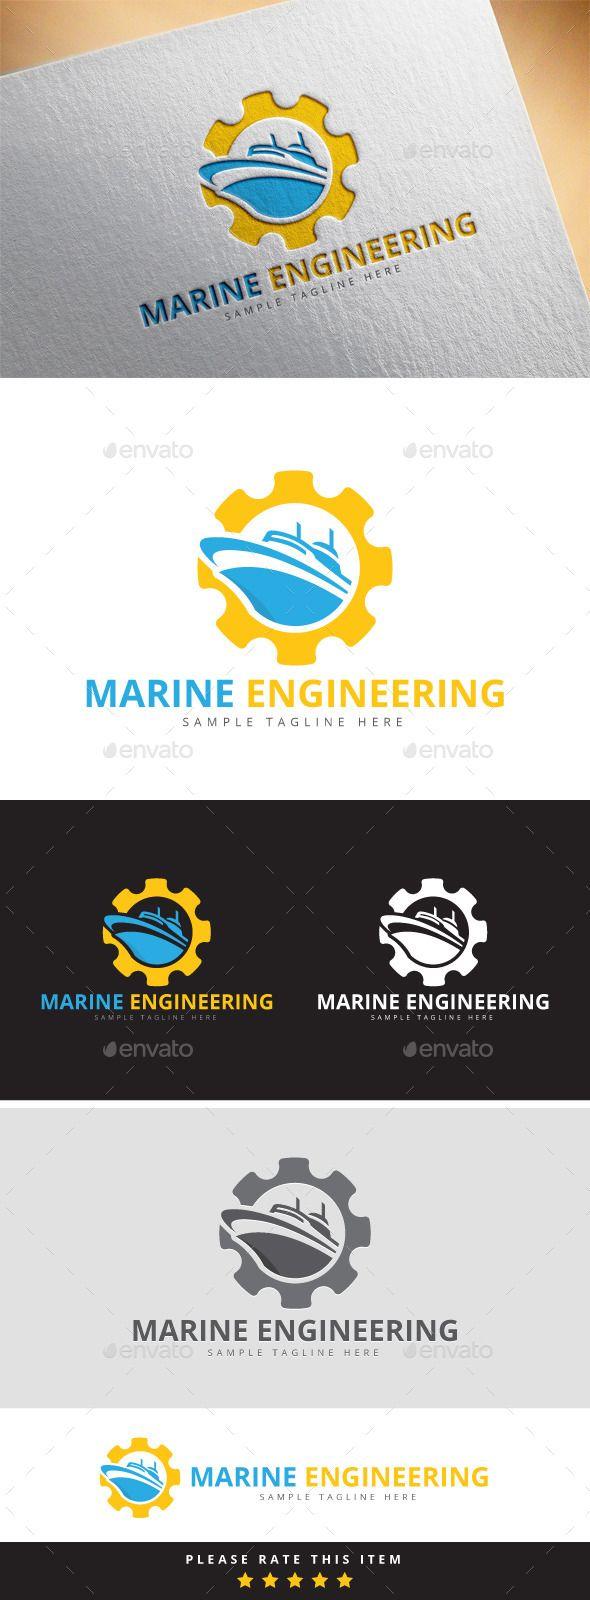 Merchant Marine Engineer Logo